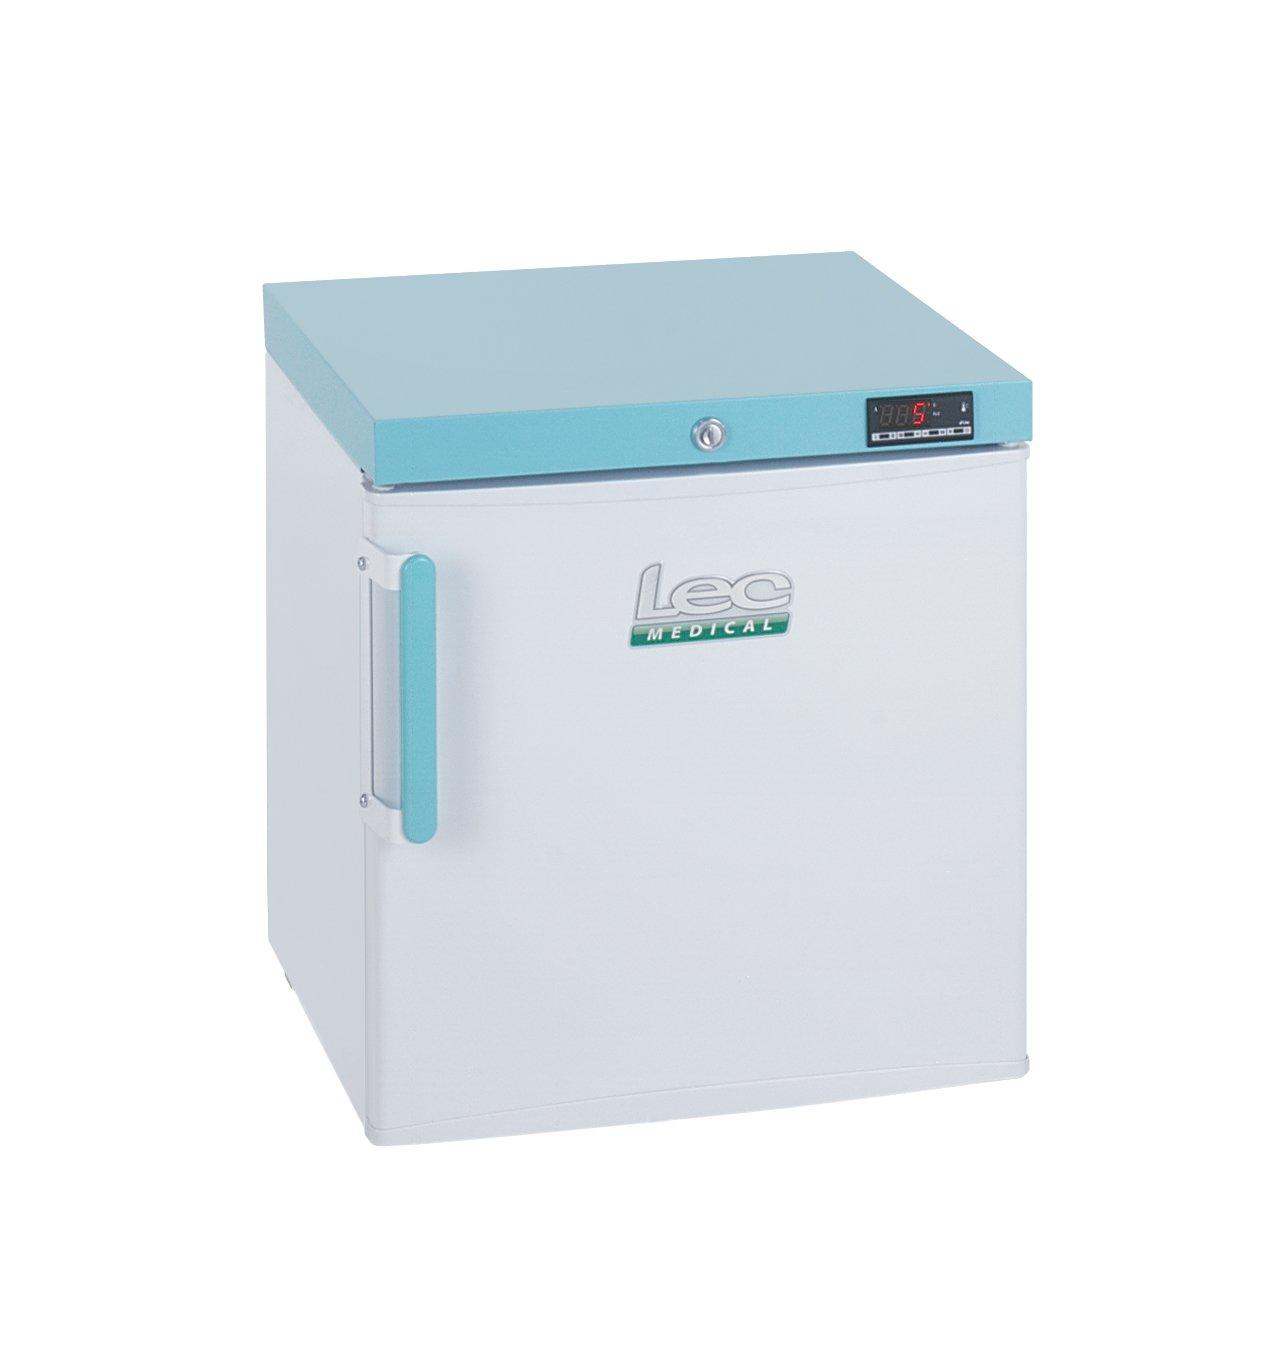 lec medical pe109c refrigerator amazon co uk health personal care rh amazon co uk lec medical fridge manual pe109c